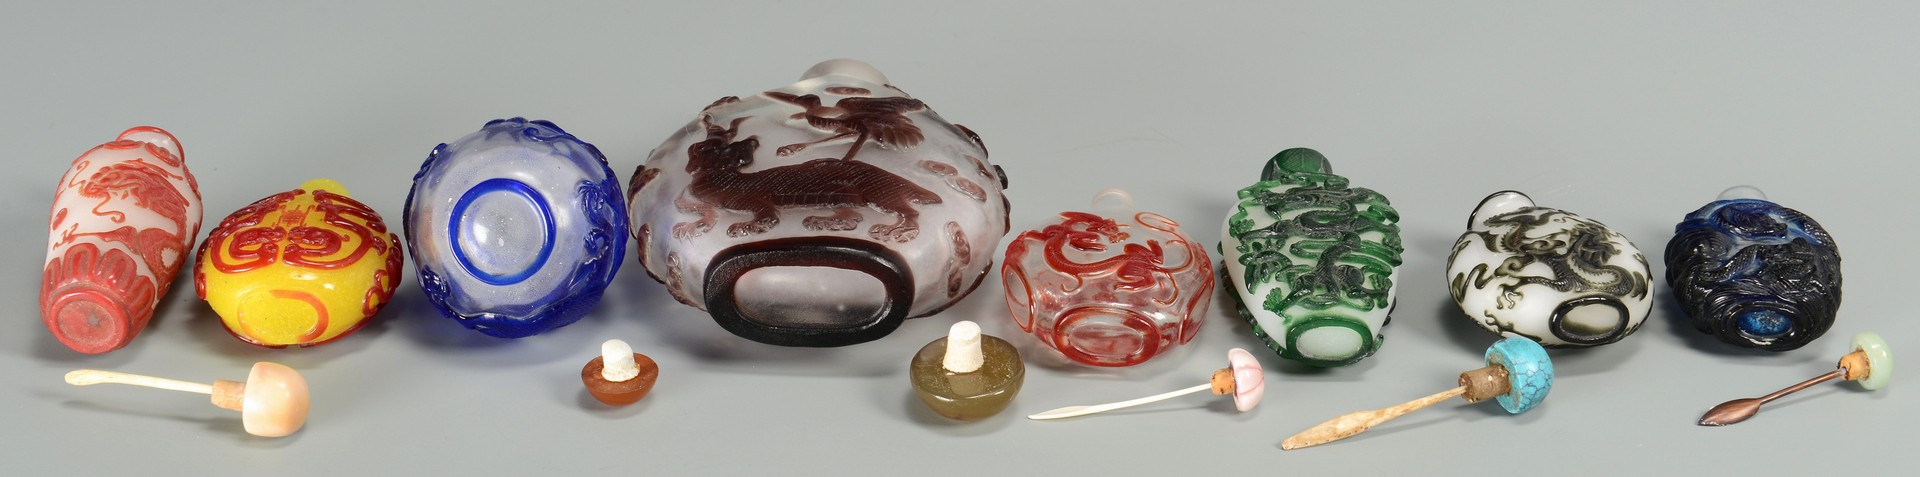 Lot 3594186: 8 Peking Glass Snuff Bottles